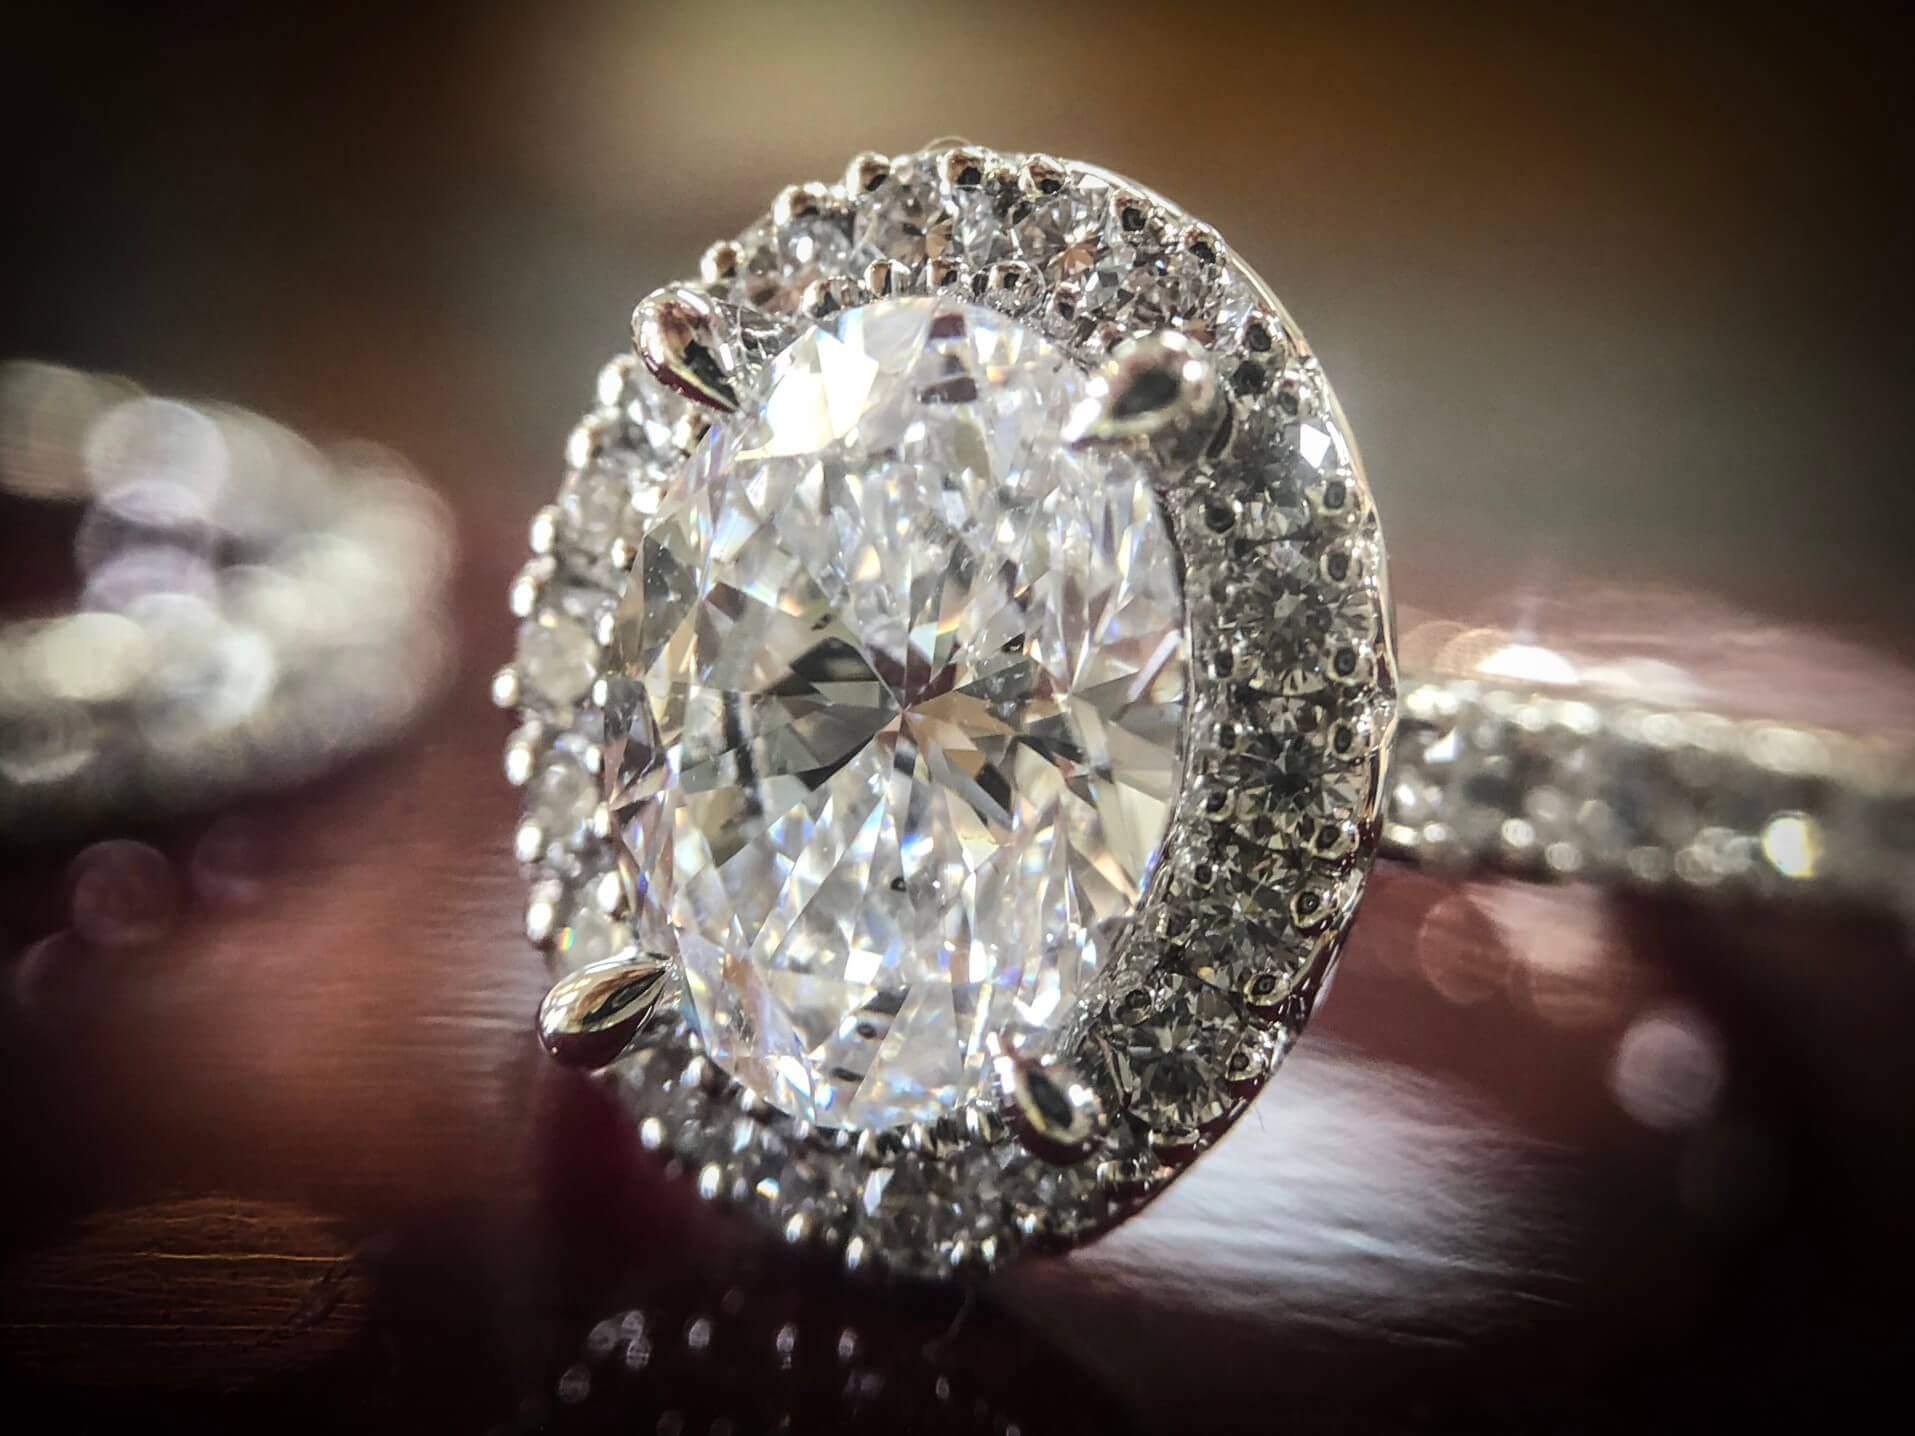 5 Reasons to Buy Diamond Jewellery Online